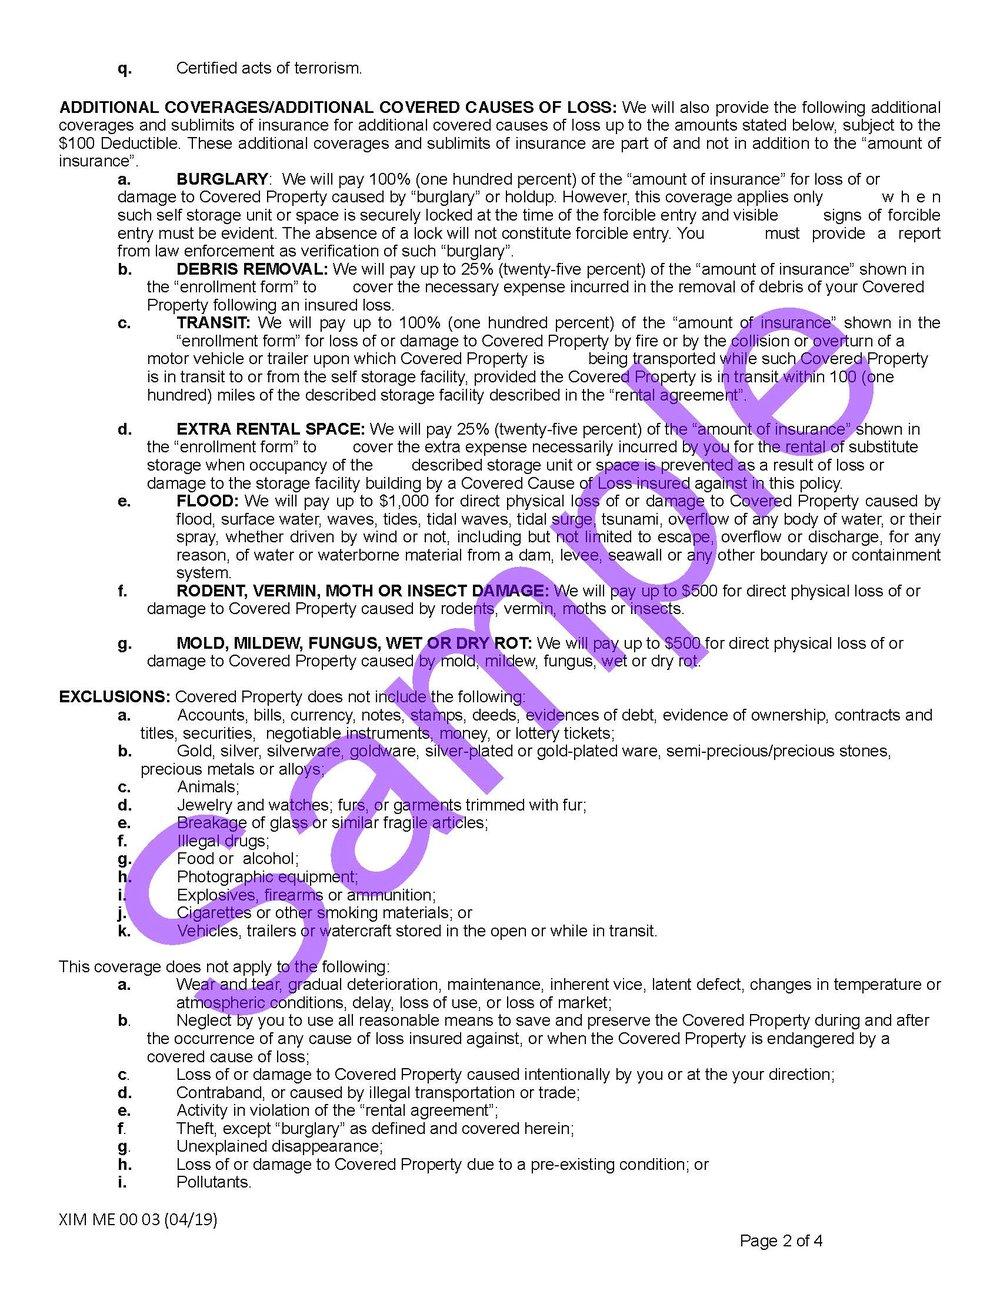 XIM ME 00 03 04 19 Maine Certificate of InsuranceSample_Page_2.jpg